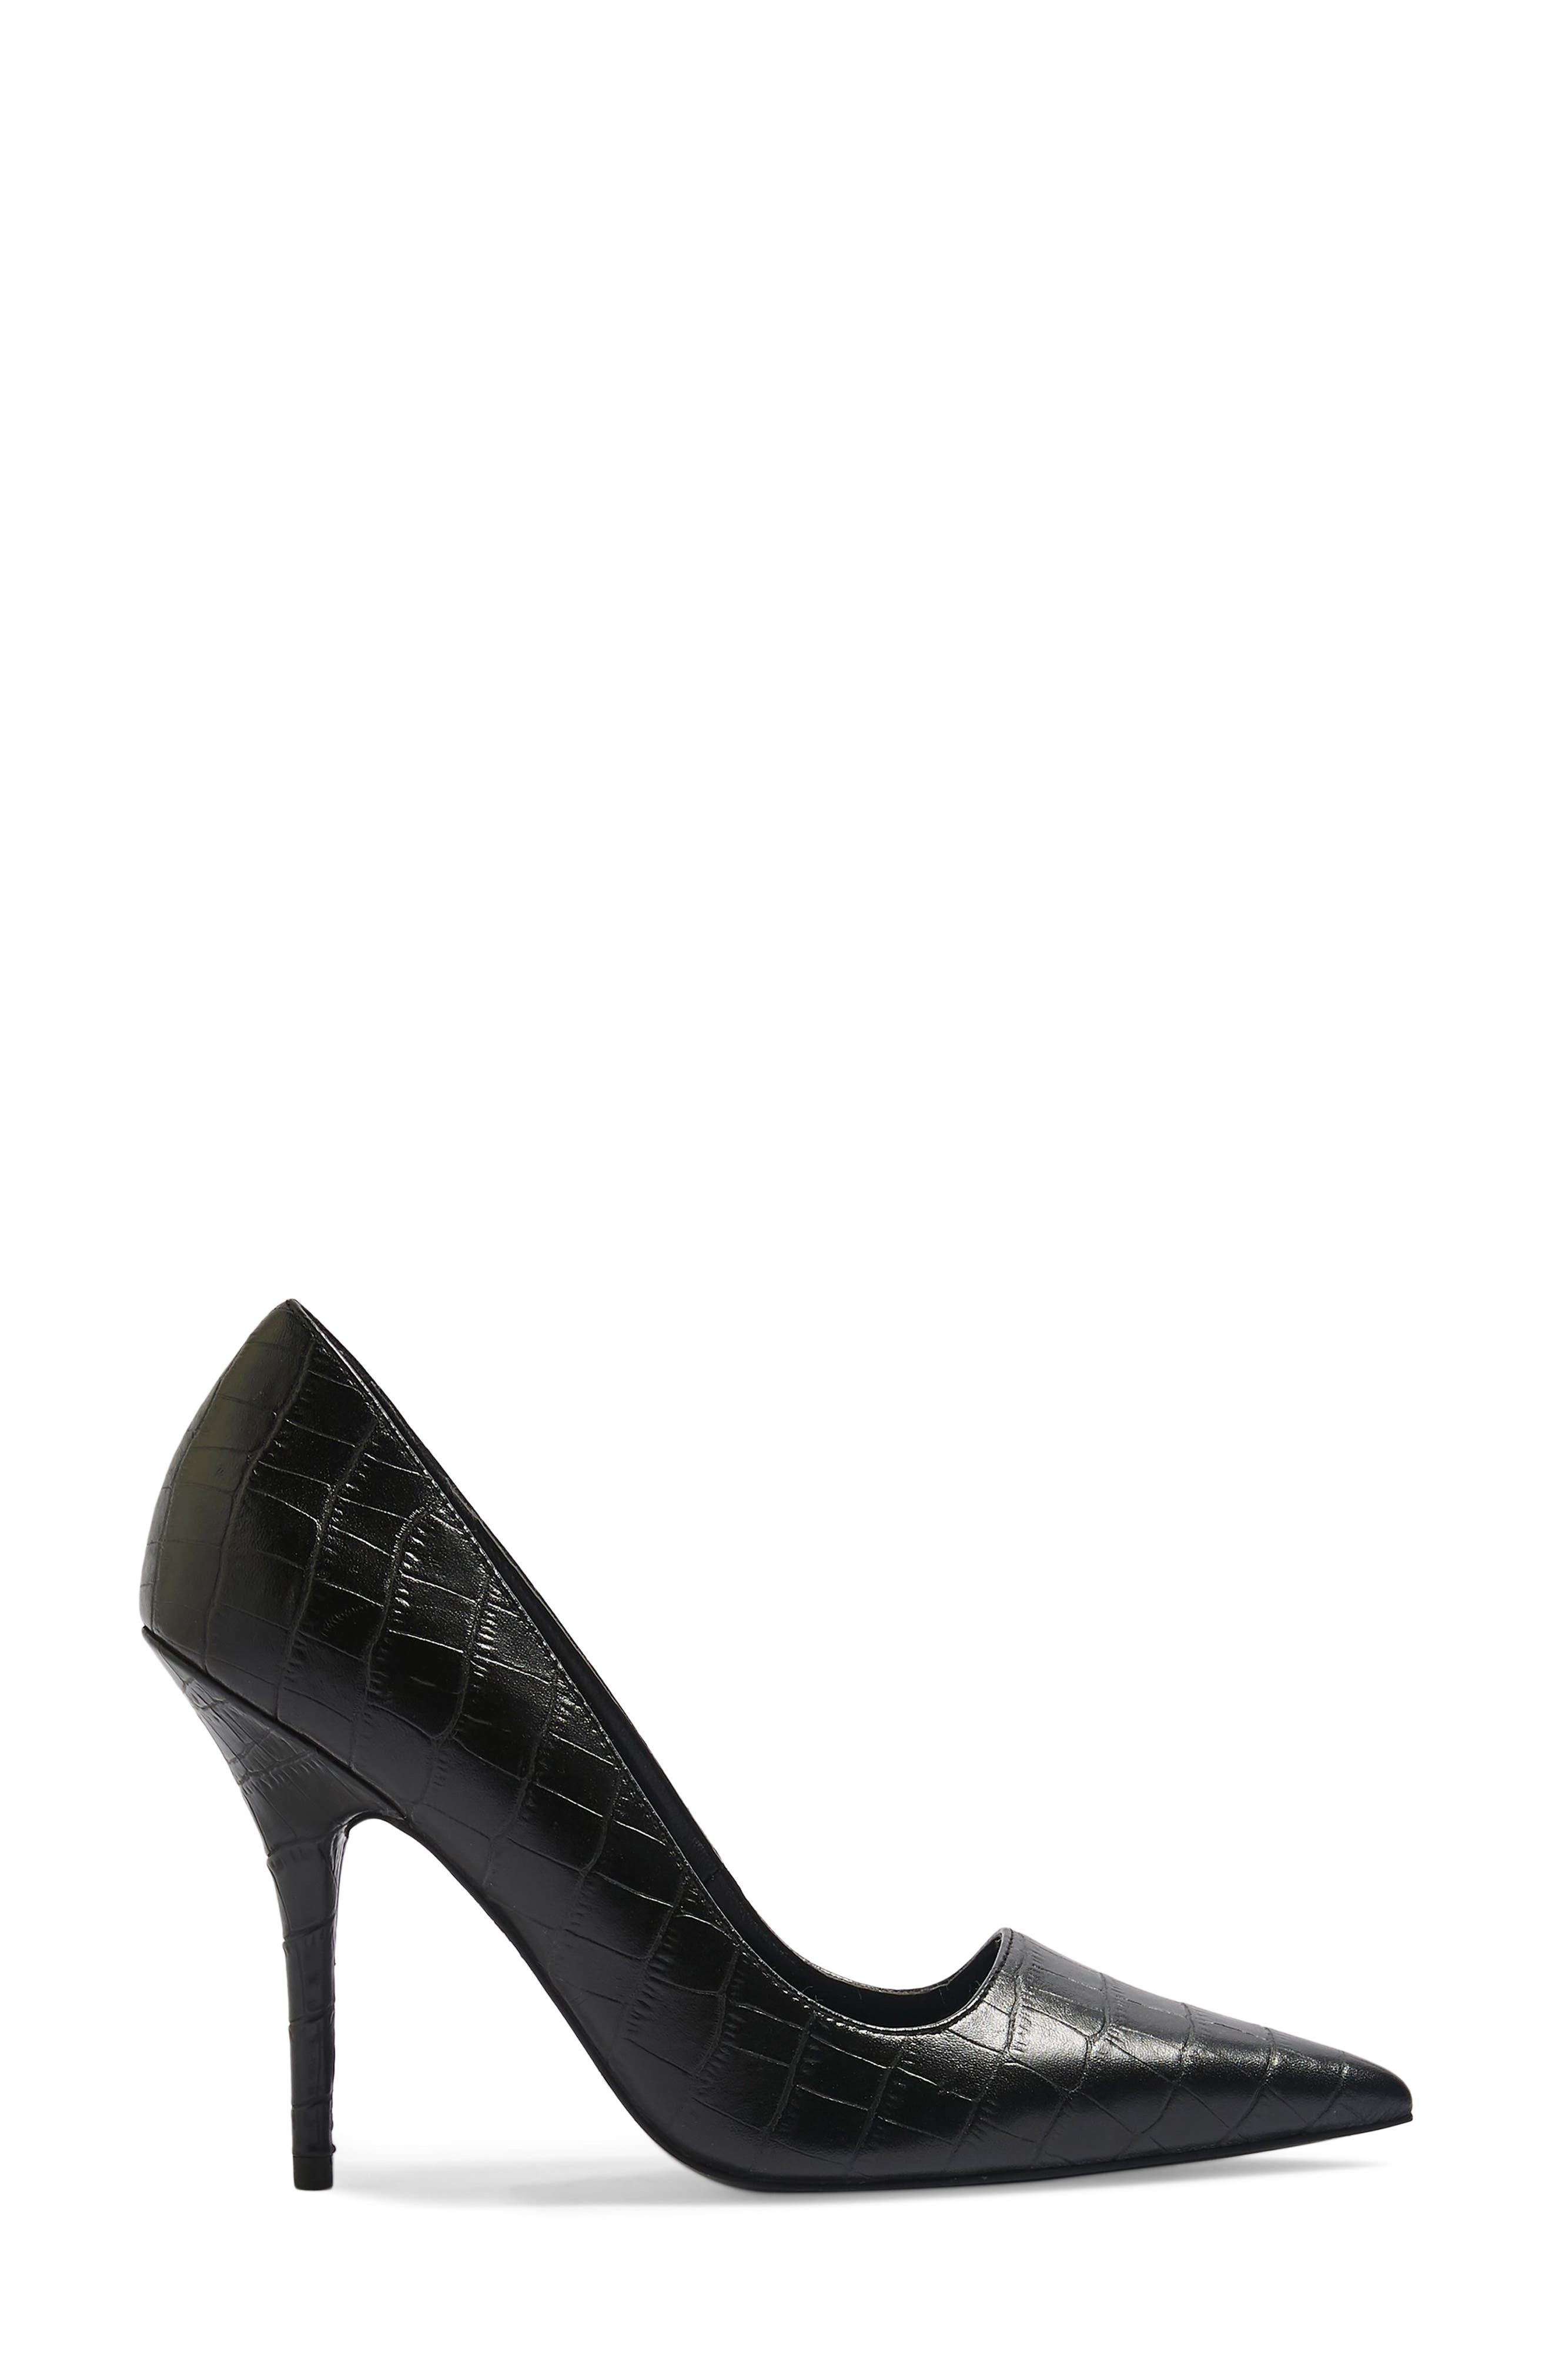 5405c9e8b0ea Topshop Women s Shoes